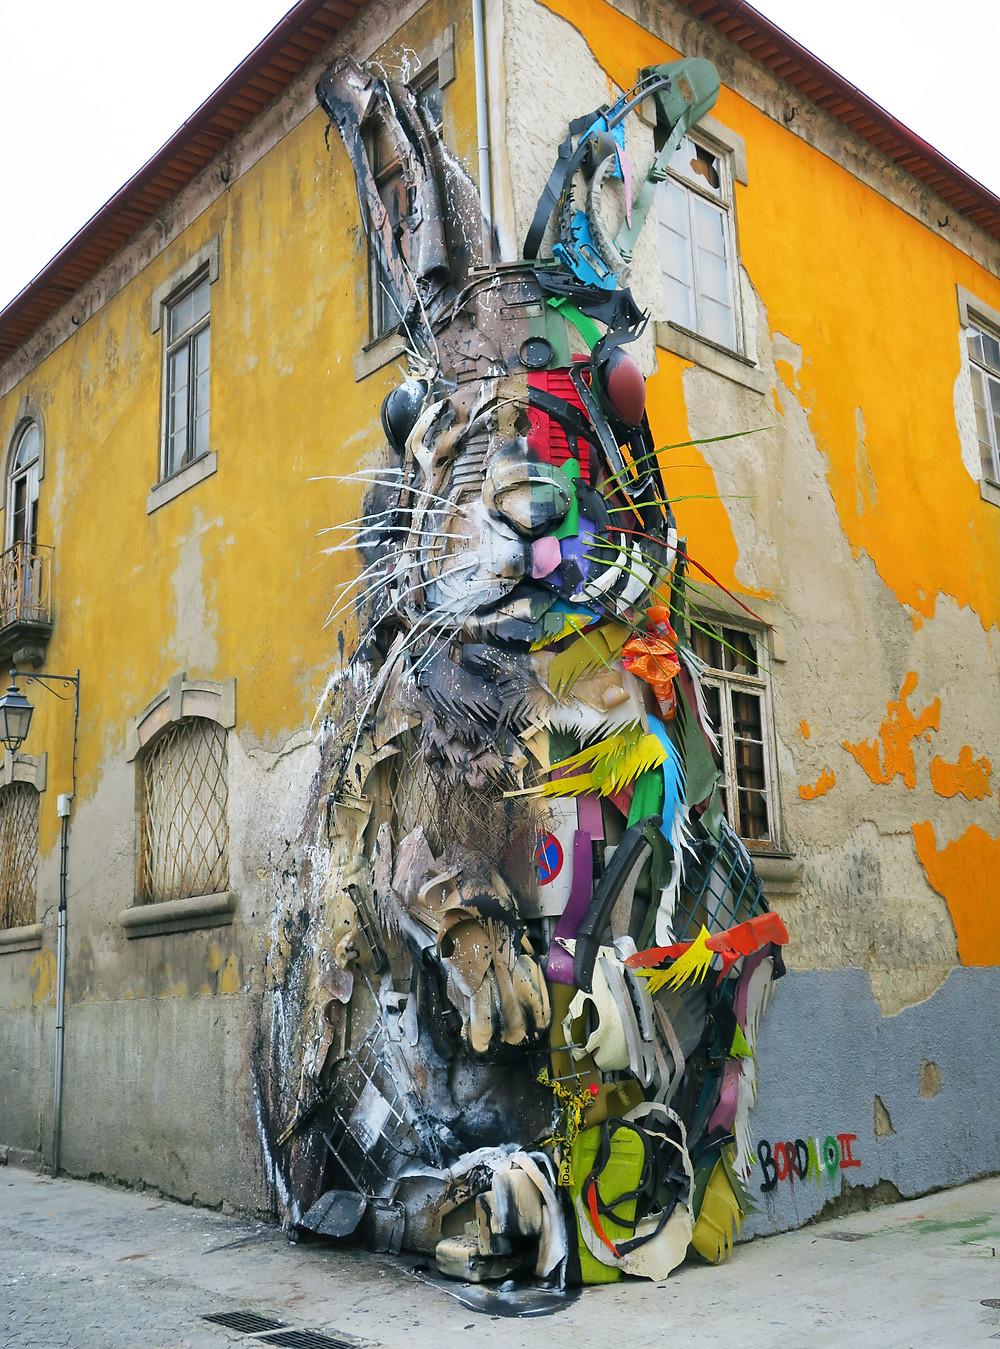 2017 - Half Rabbit - Gaia, Portugal - photo by Bordalo II.jpg